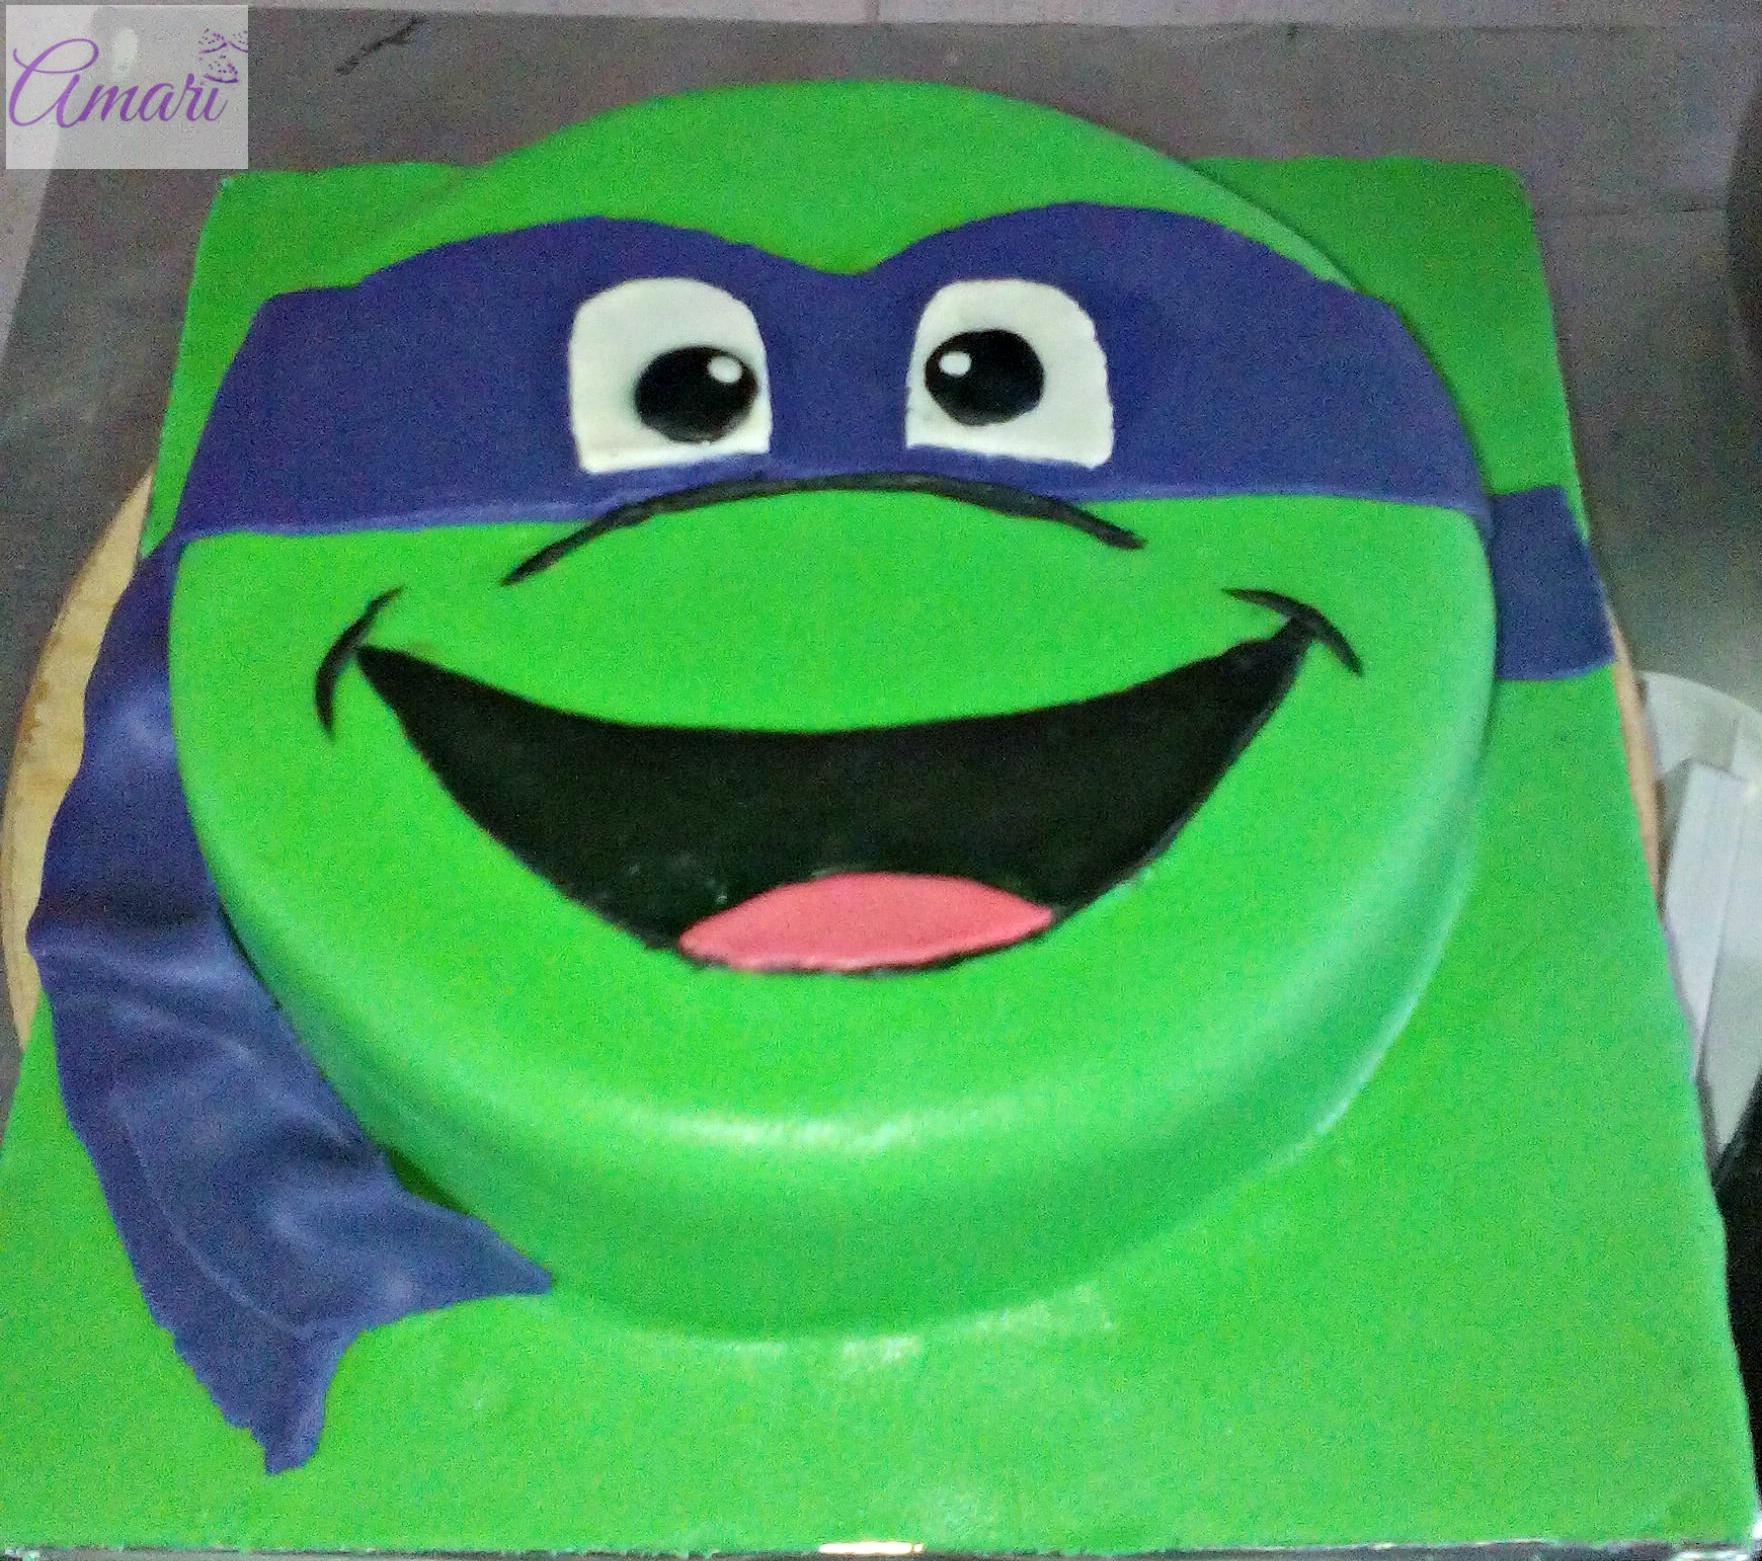 Surprising Teenage Mutant Ninja Turtle Birthday Cake Tutorial Amari Baking Personalised Birthday Cards Paralily Jamesorg